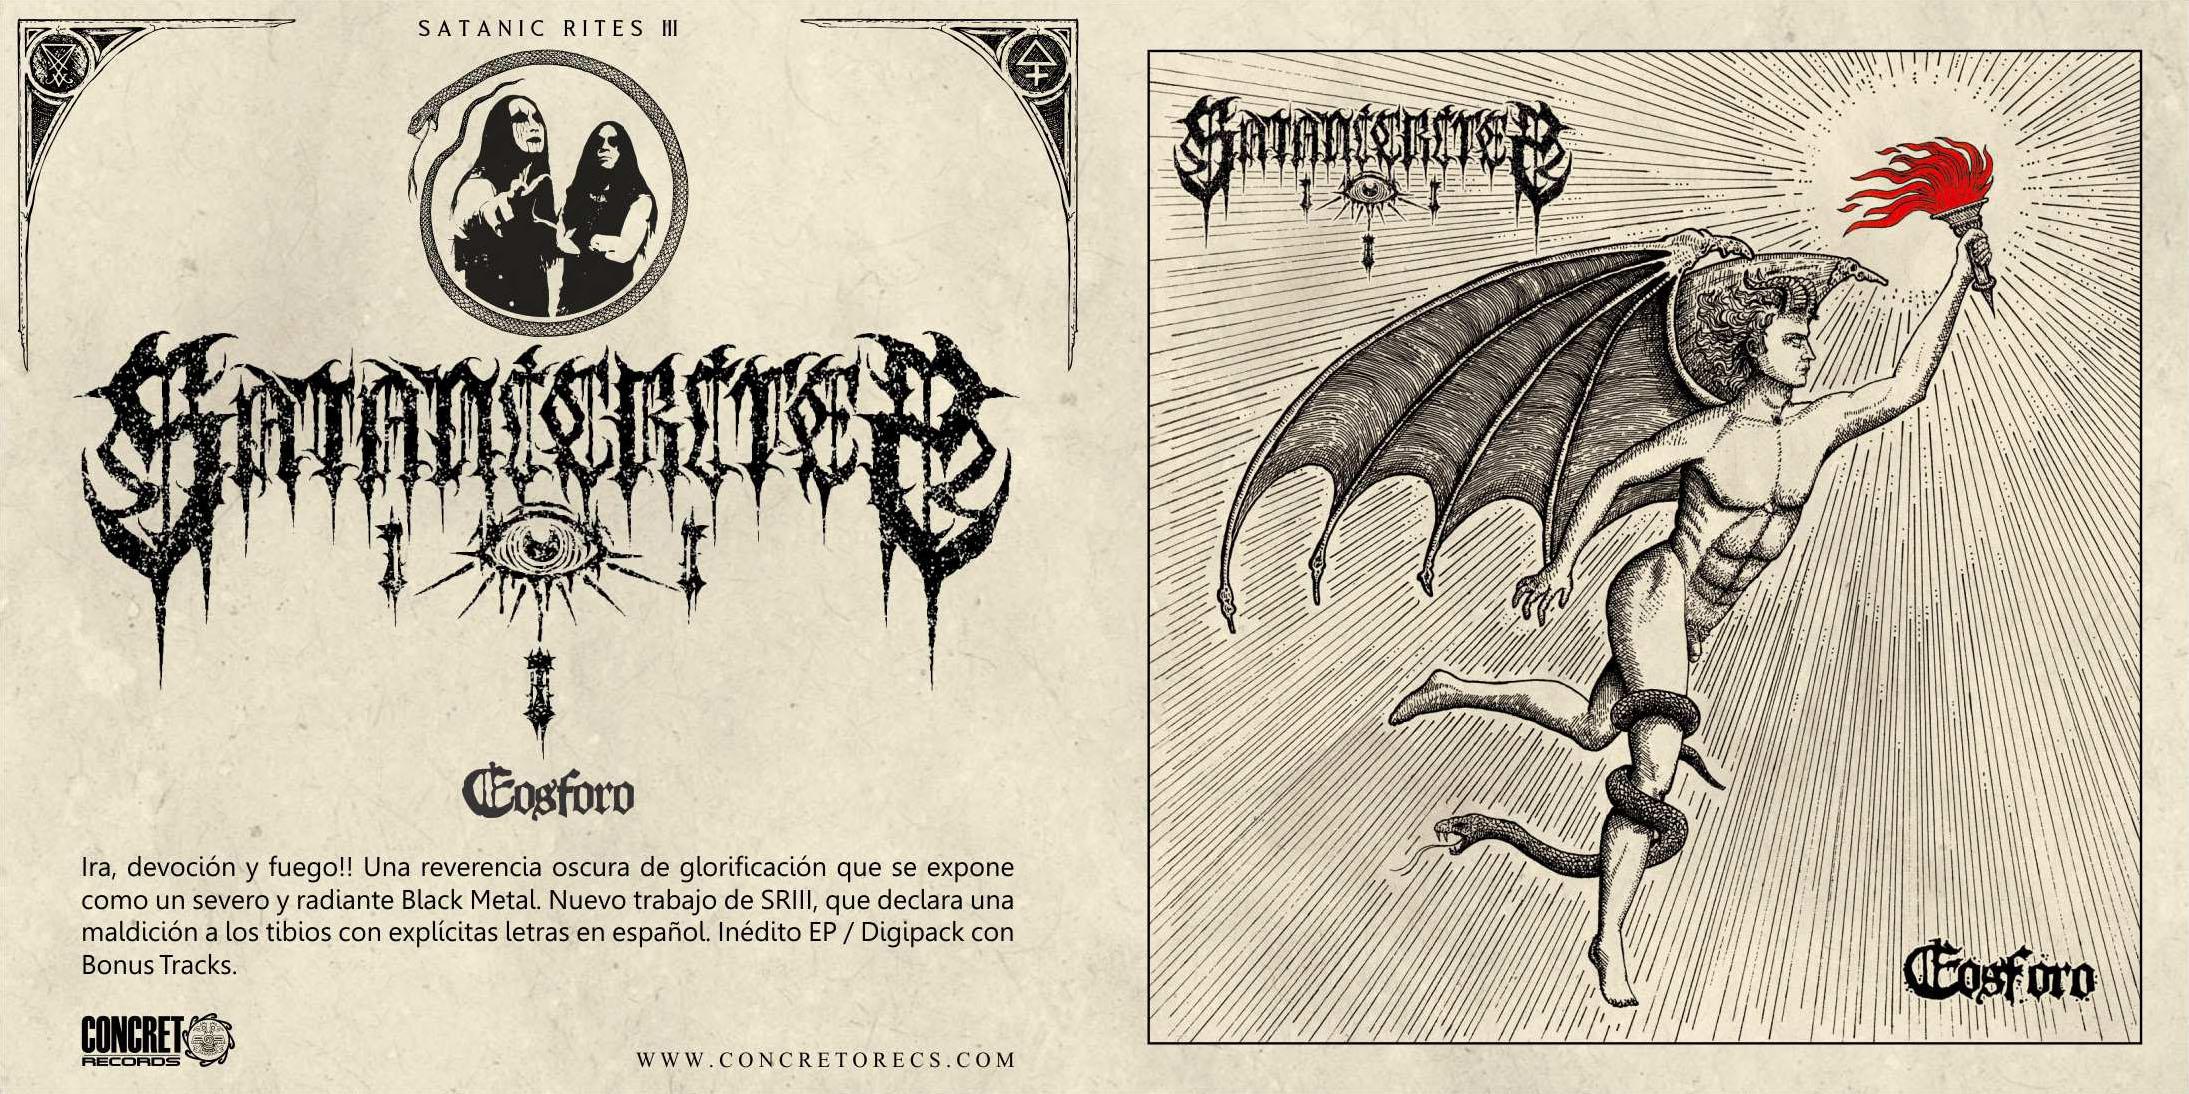 Satanic Rites III